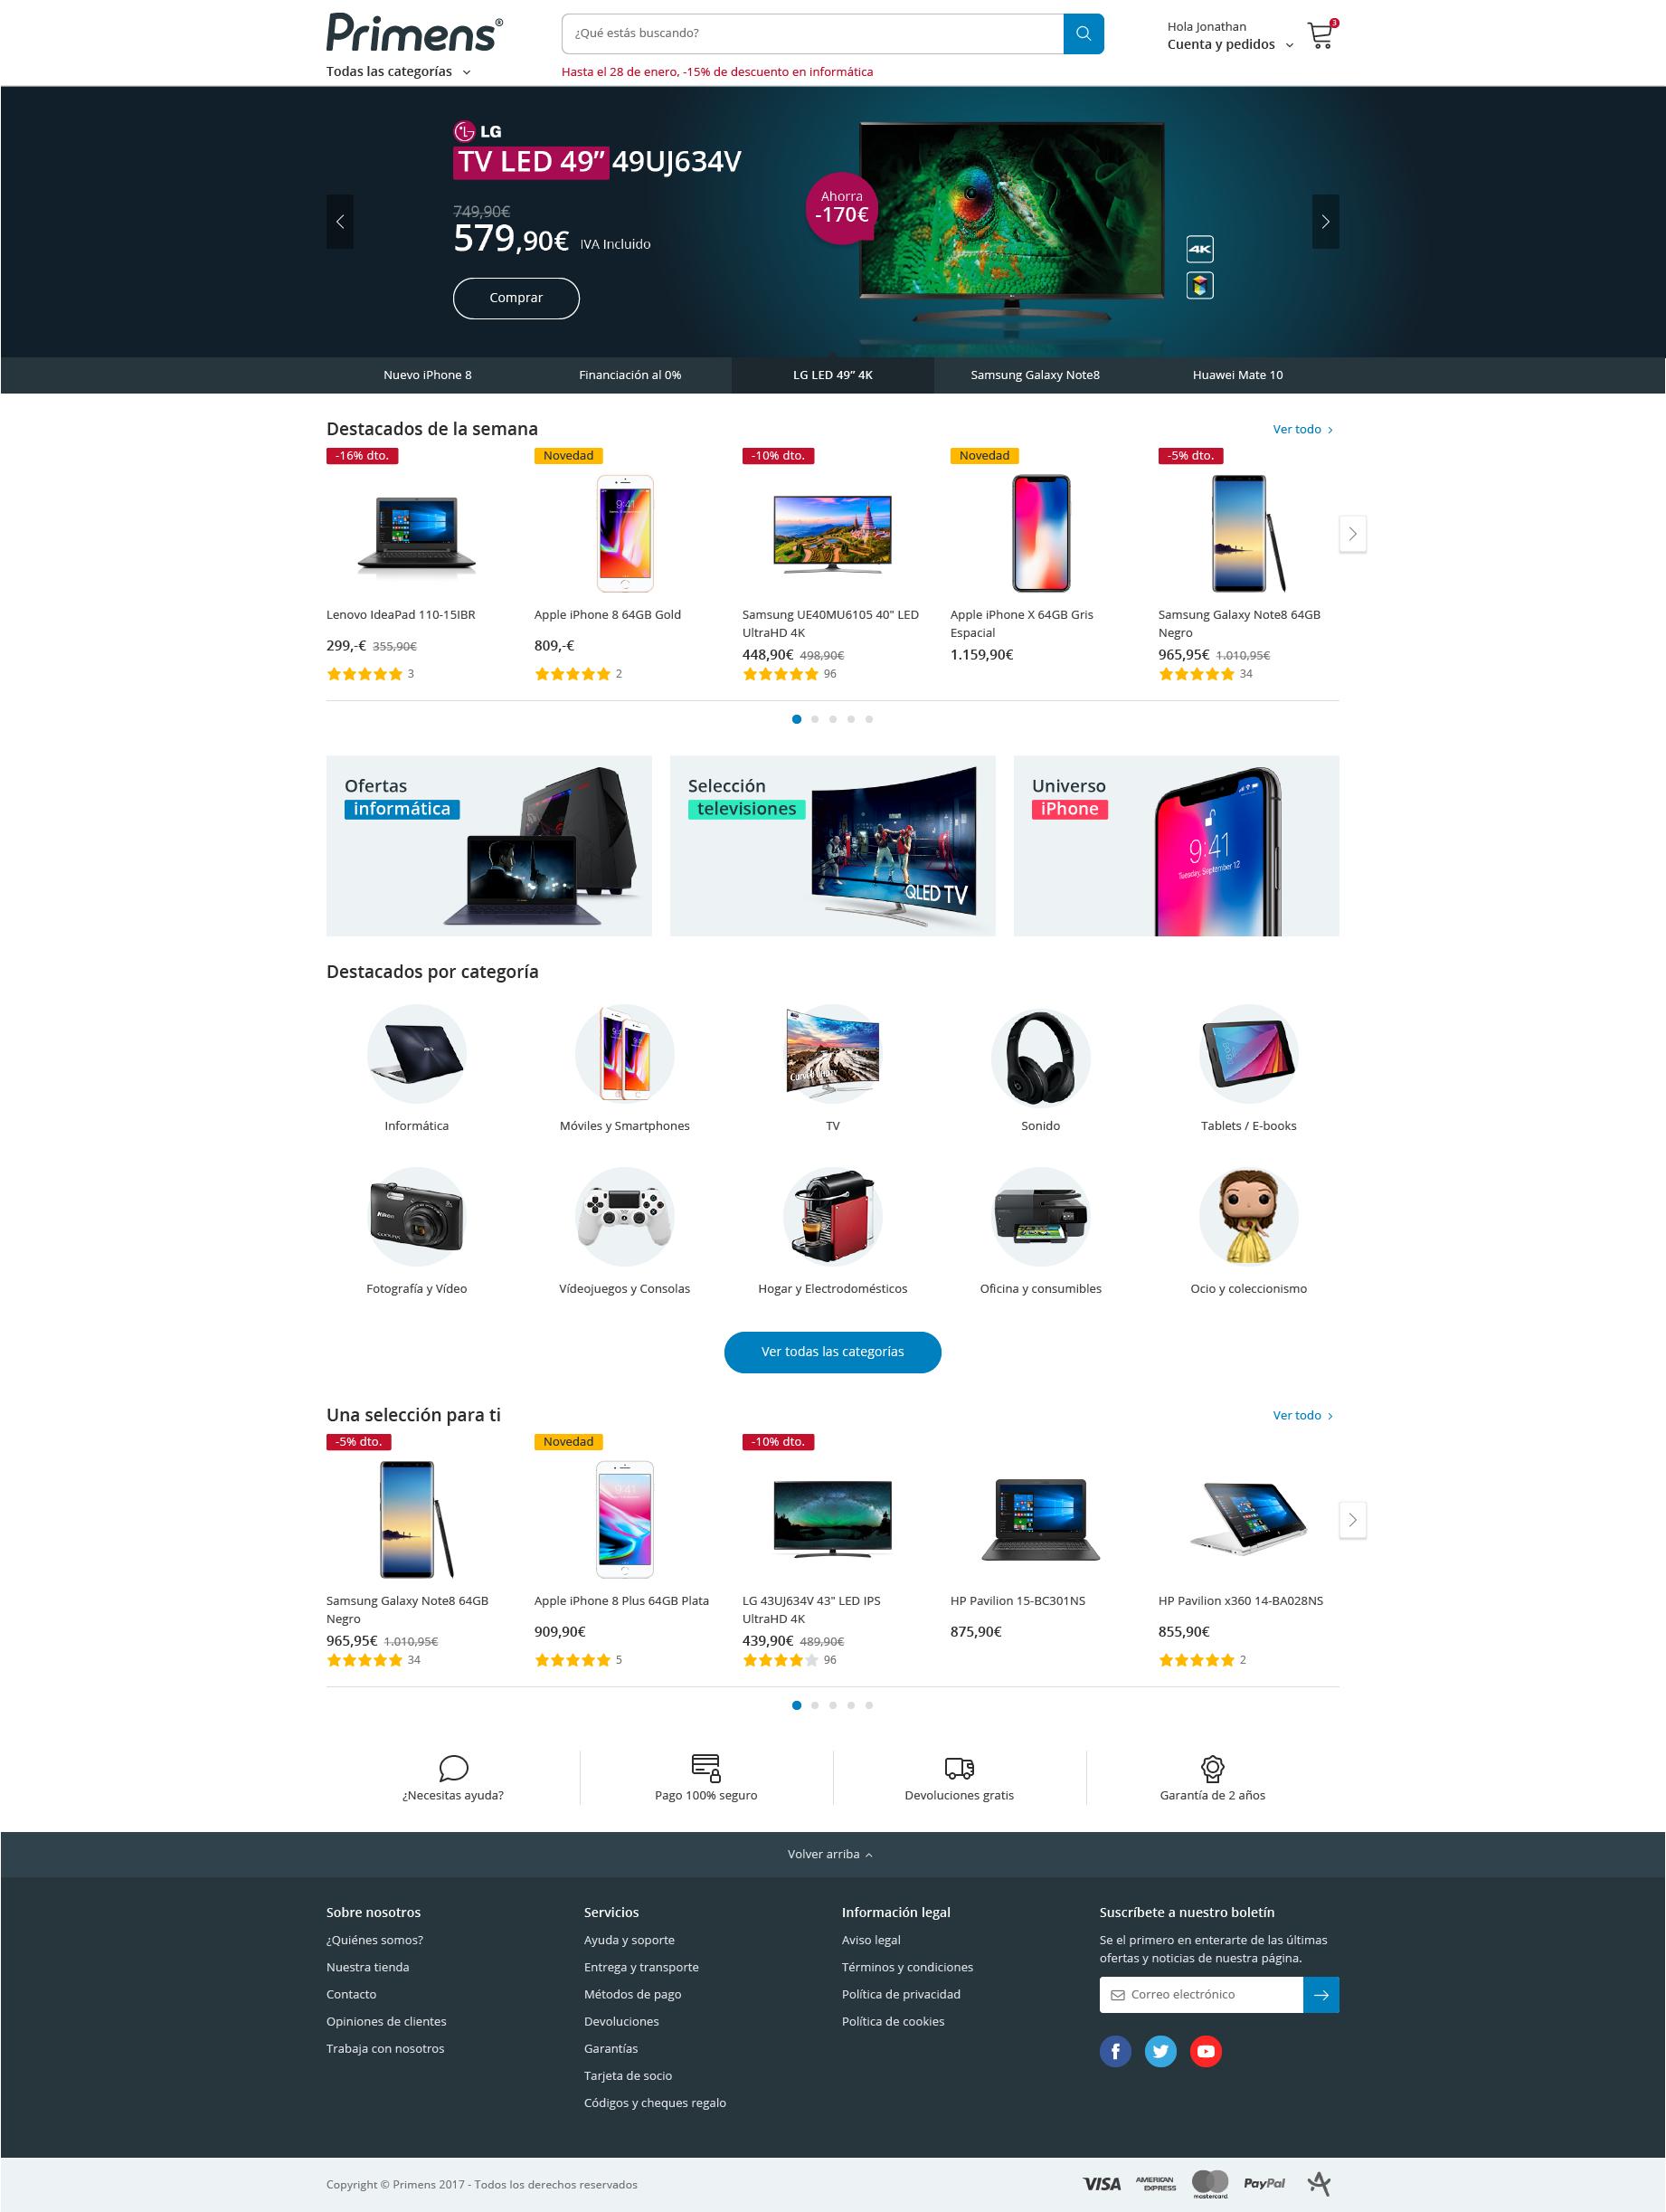 Primens desktop home